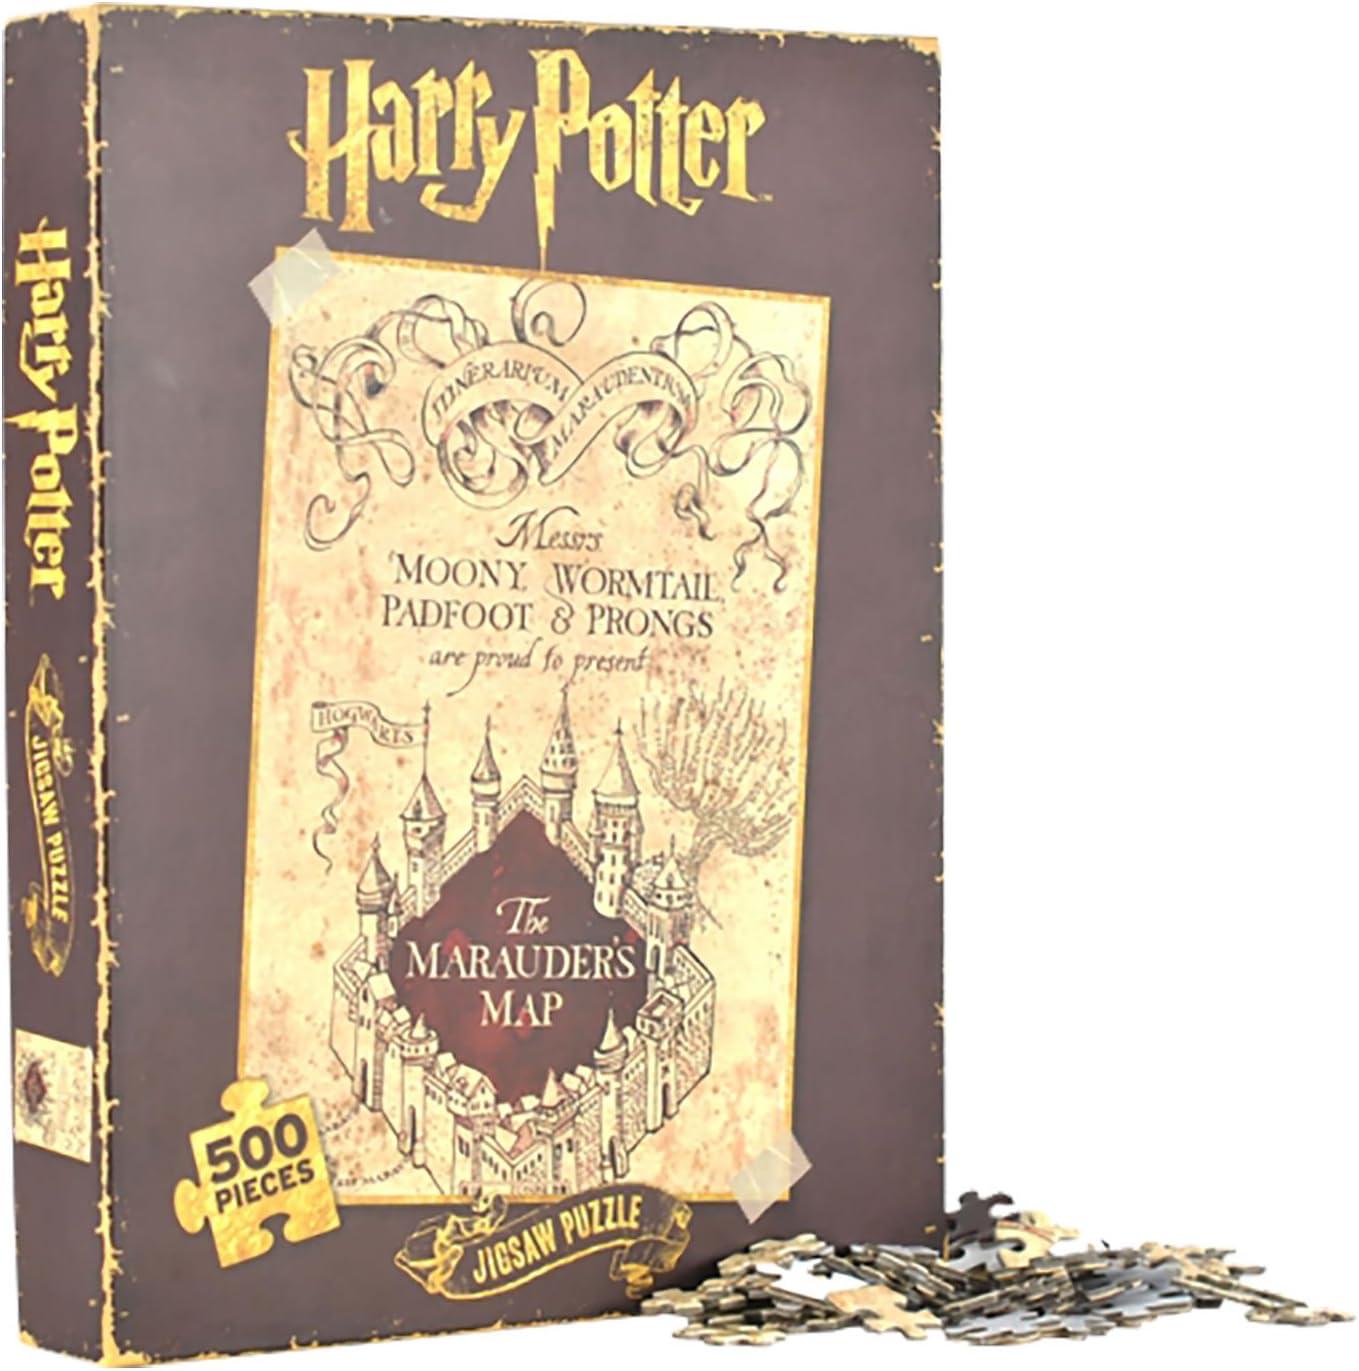 Harry Potter Marauders Map 500 Piece